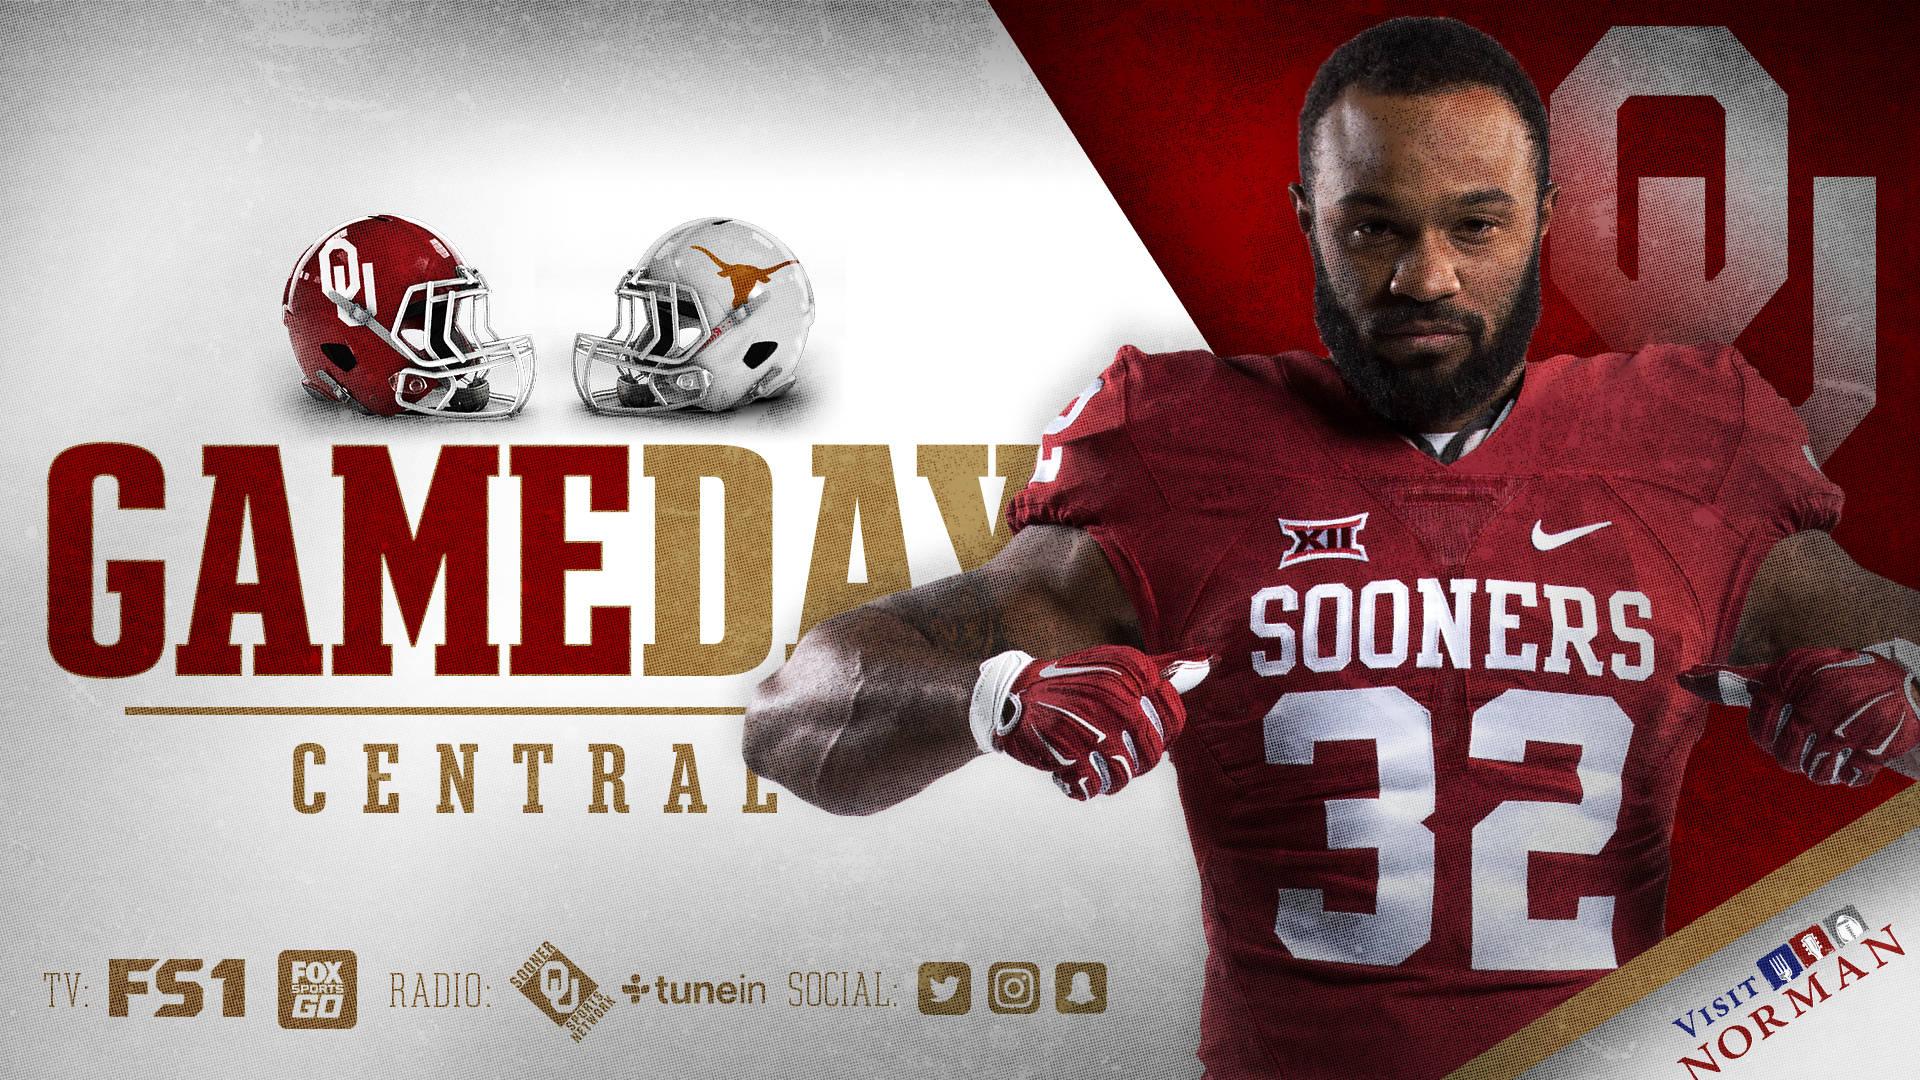 Gameday Central OU vs Texas   University of Oklahoma 1920x1080